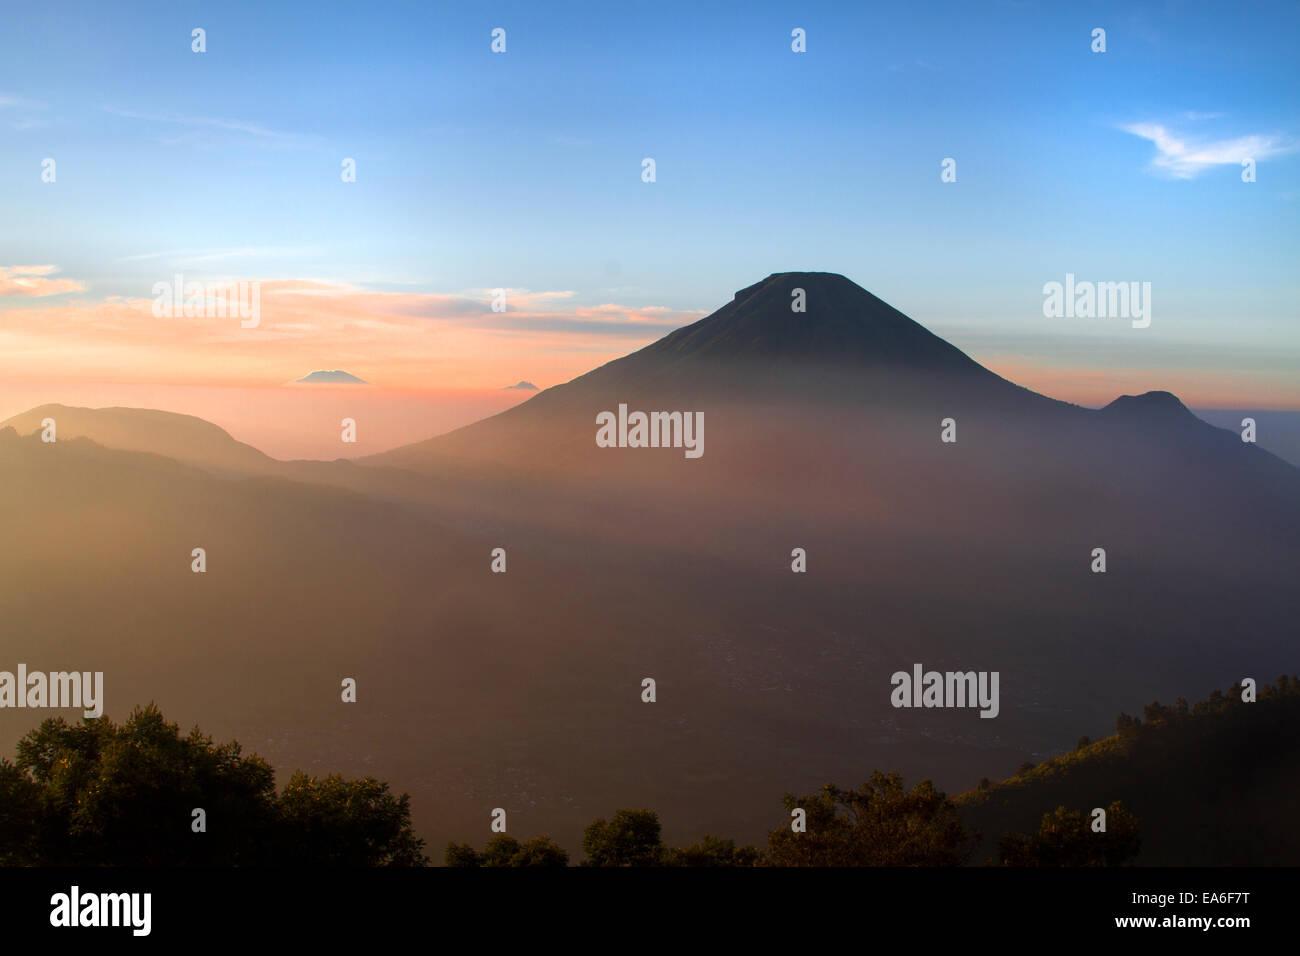 Indonesia, Central Java, Gunung Sikunir, Dieng, Mountain landscape - Stock Image